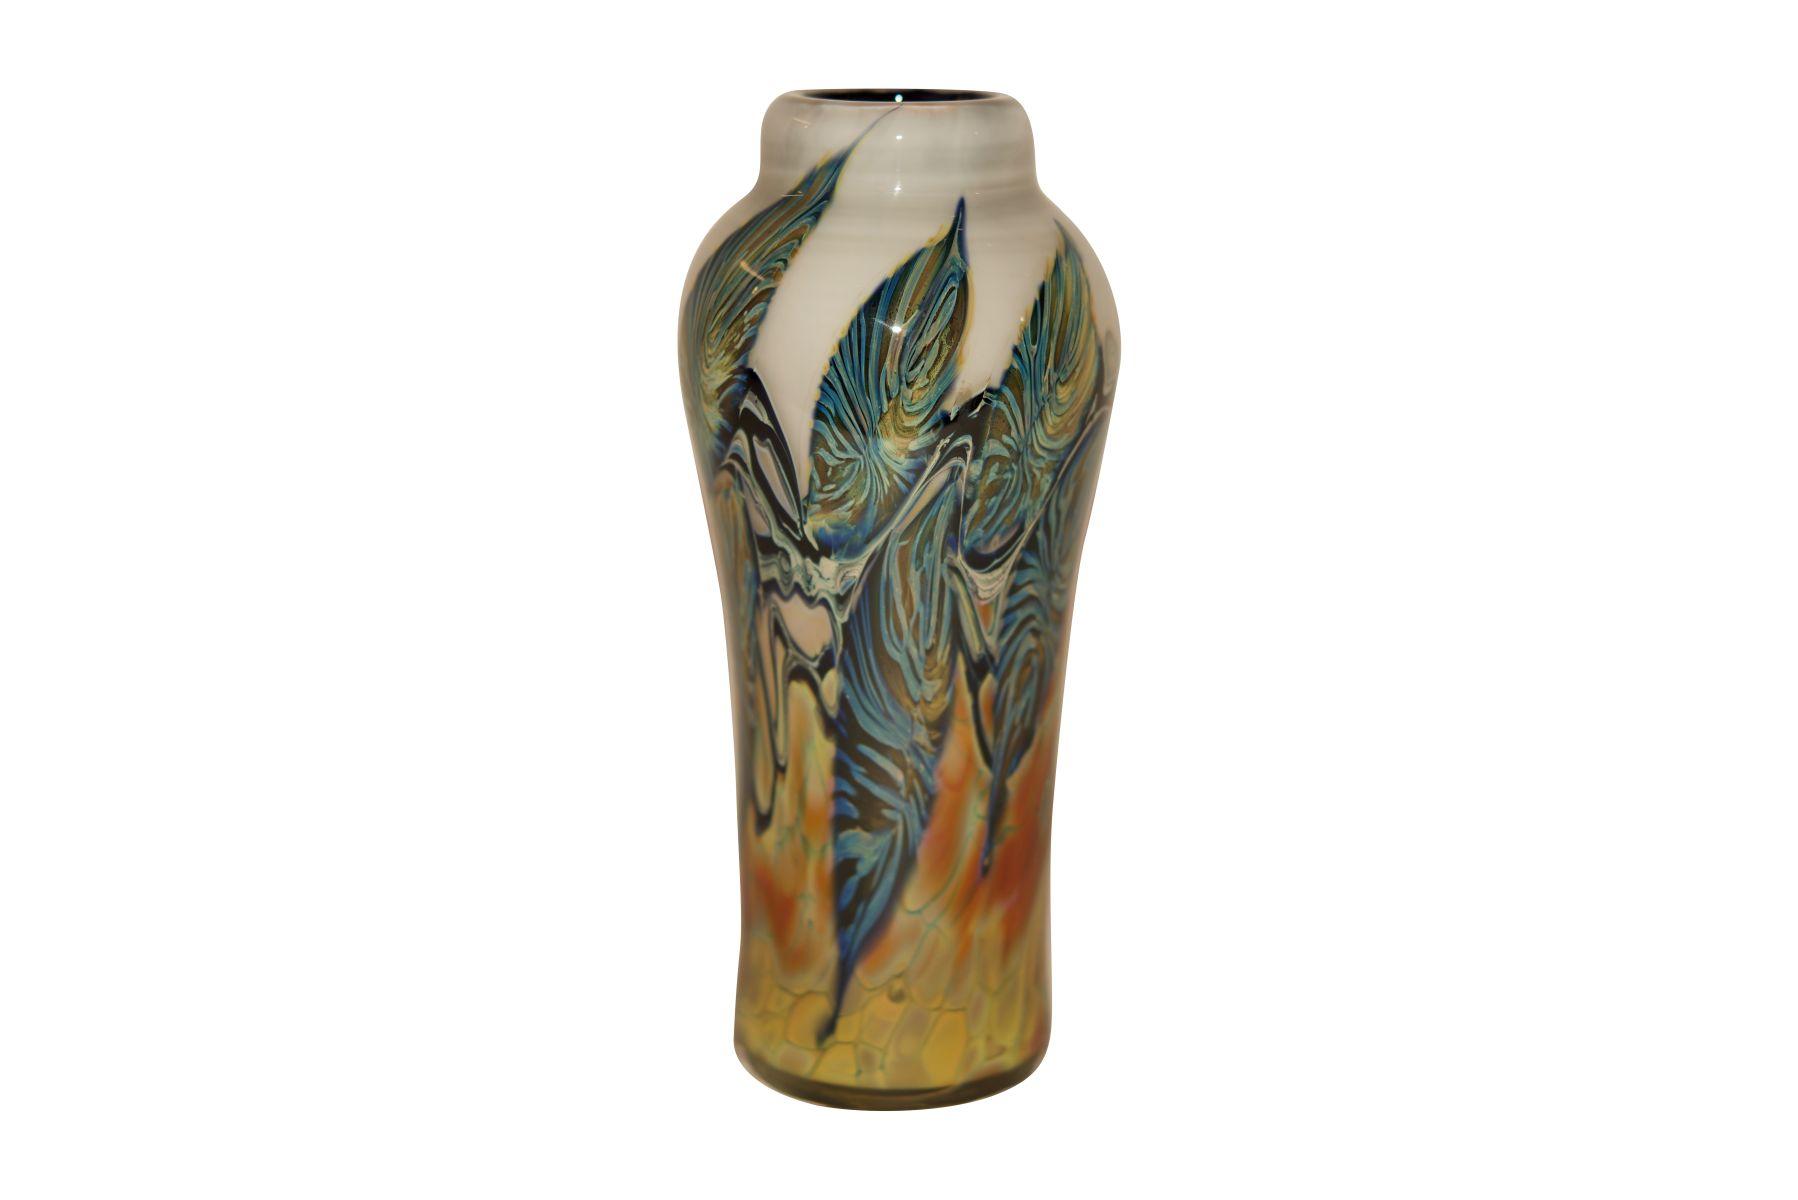 #186 Rare Vase | Seltene Vase Image